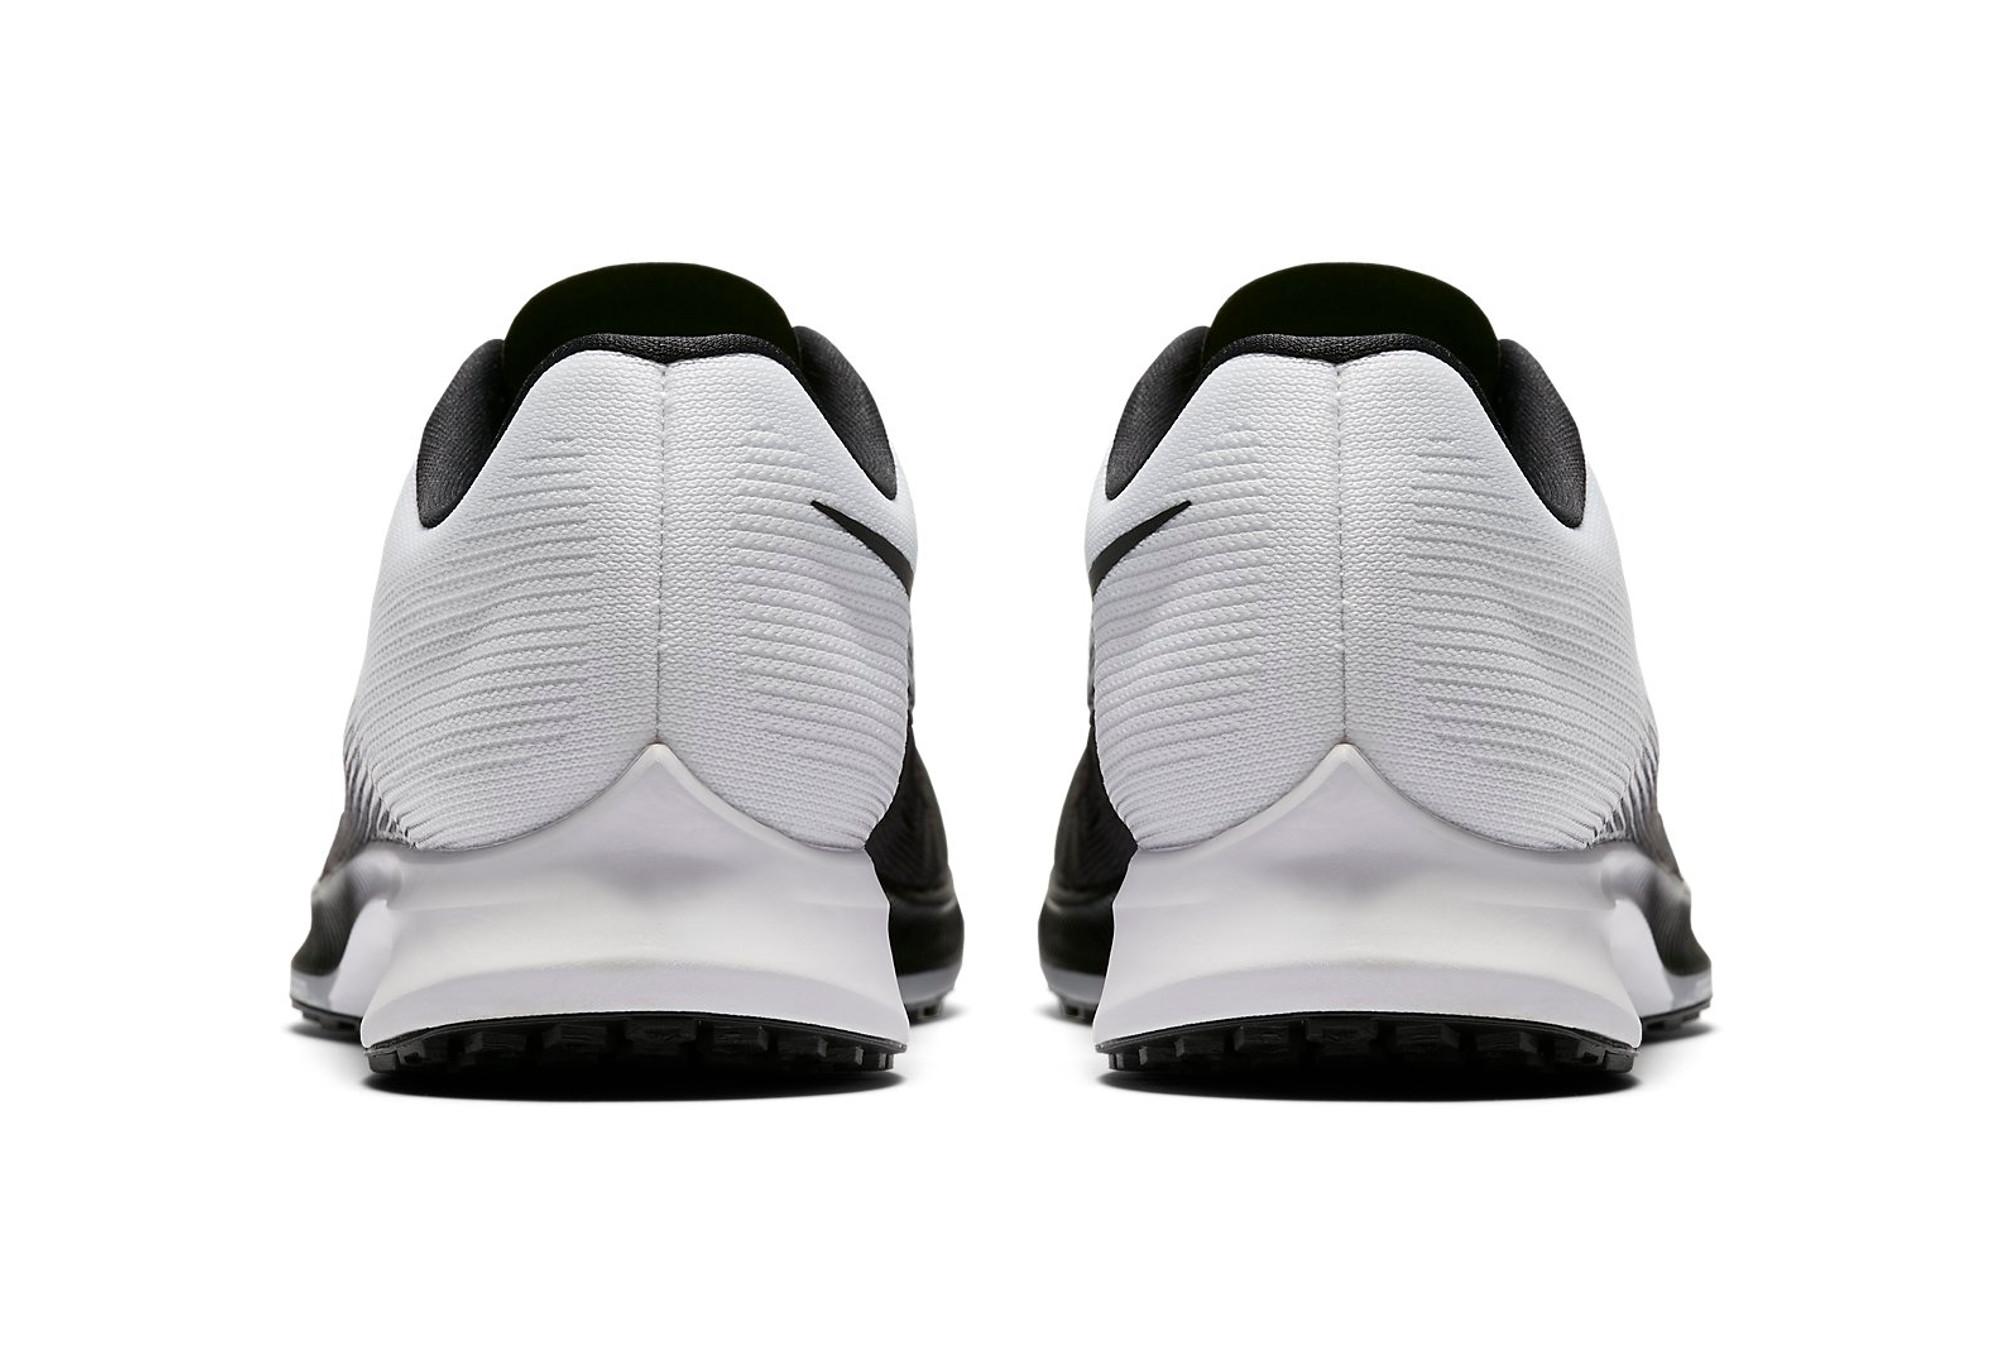 39f45ce48ba3 Chaussures de Triathlon Nike AIR ZOOM ELITE 9 Noir   Blanc ...